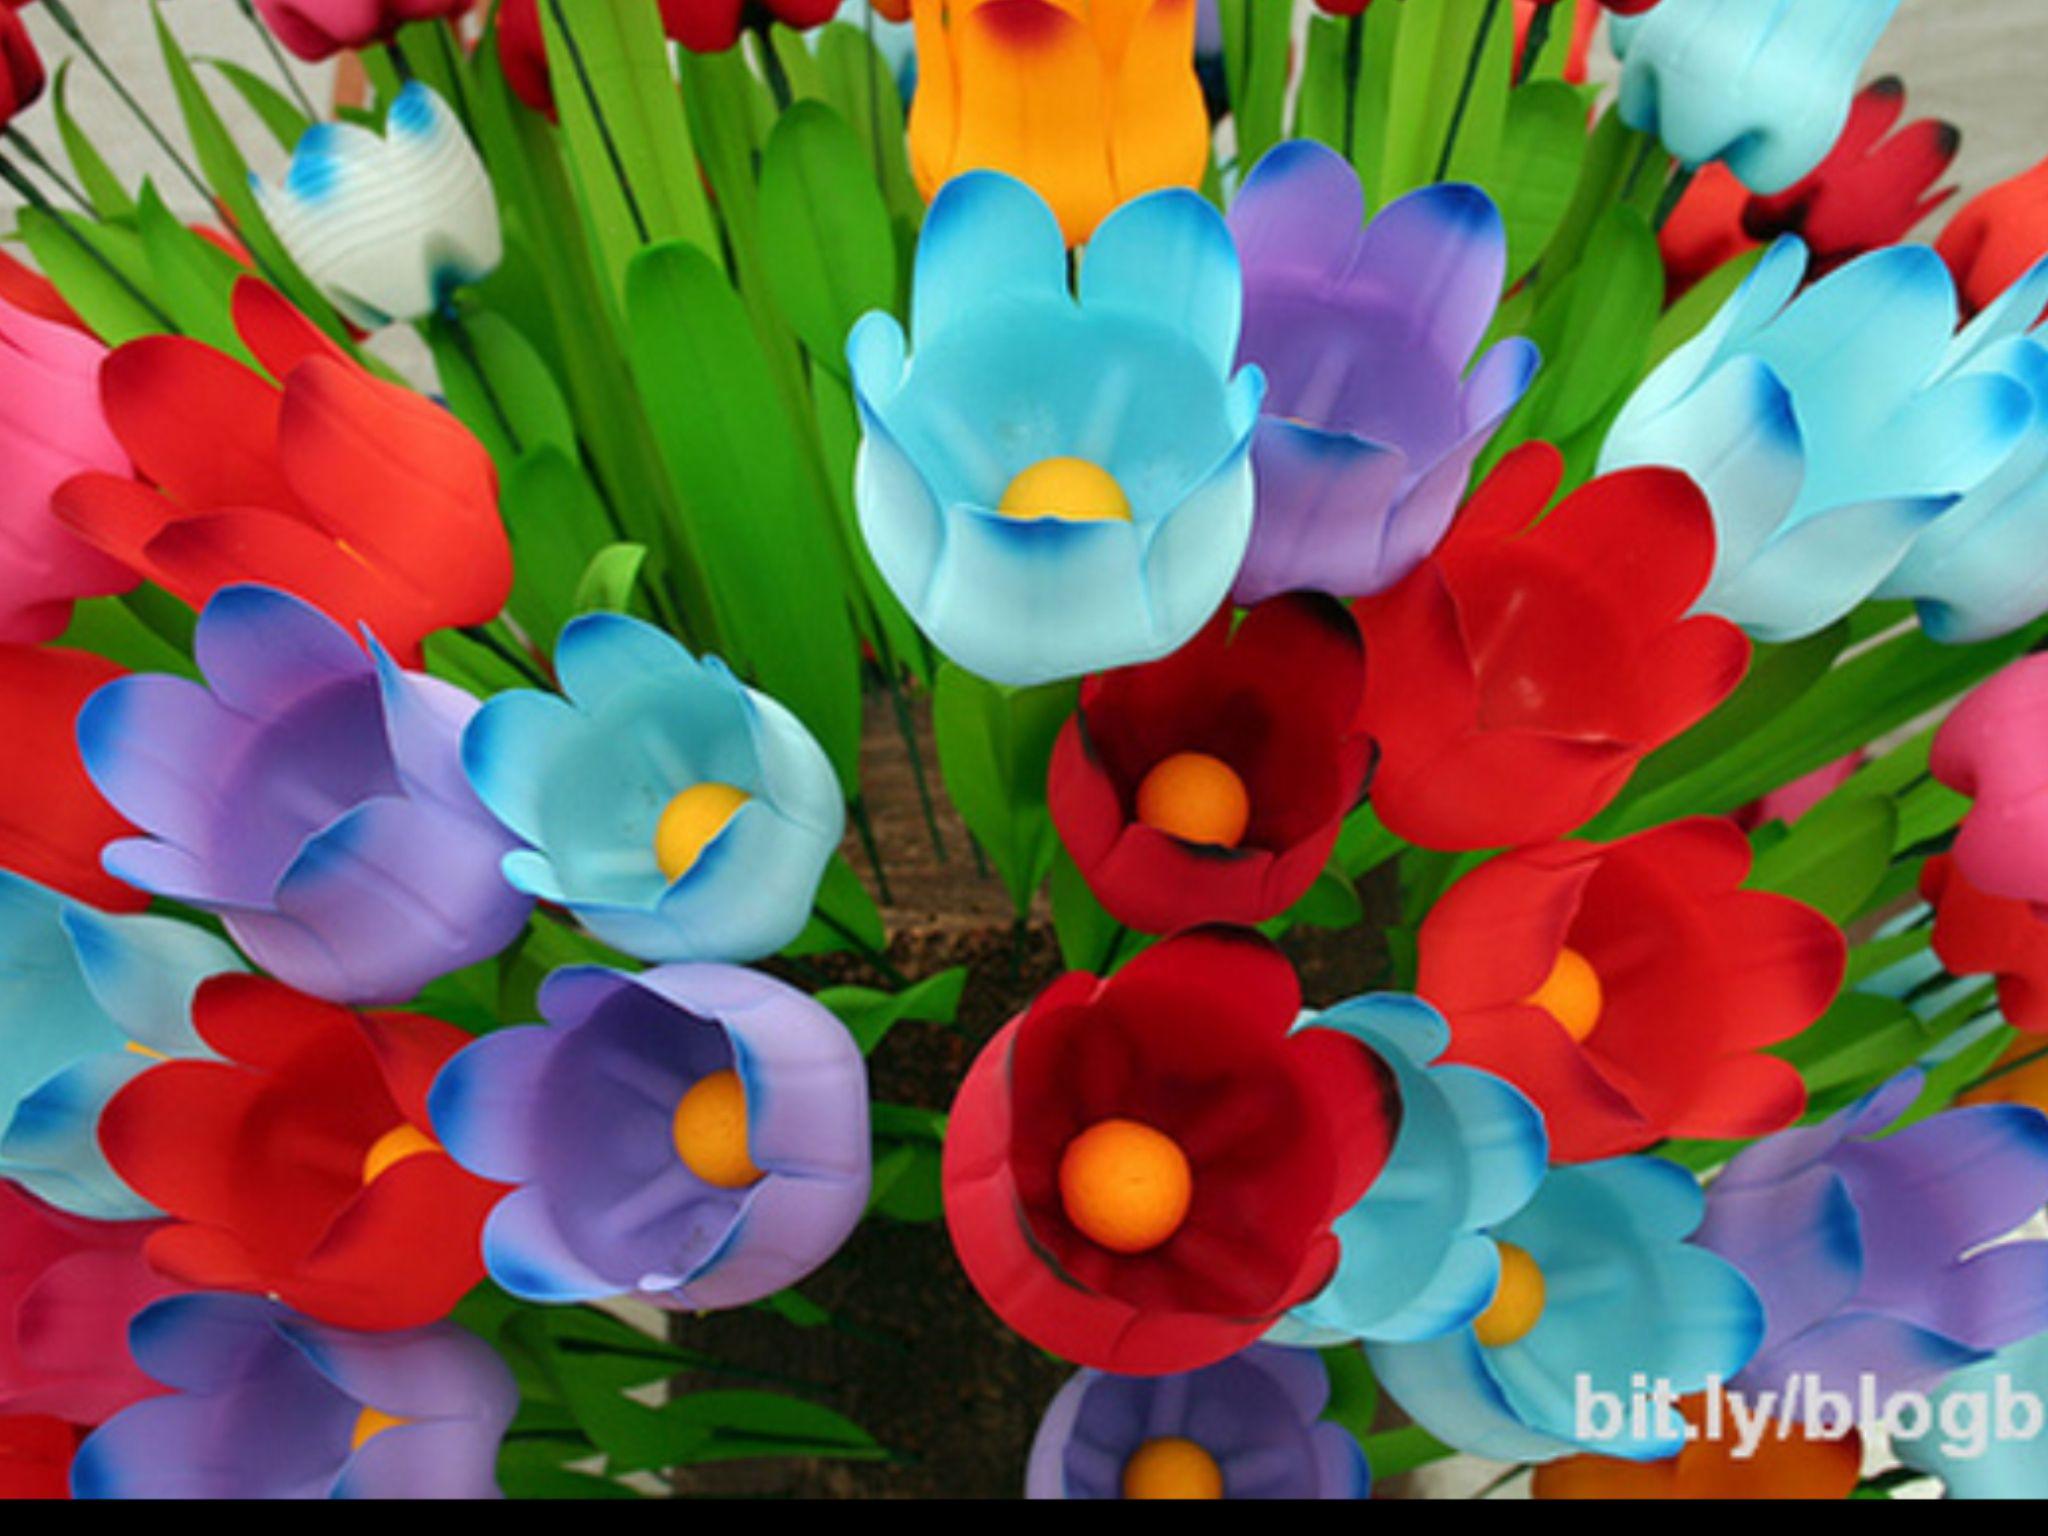 Recycled Plastic Bottles Make Pretty Flower Bouquet Blog